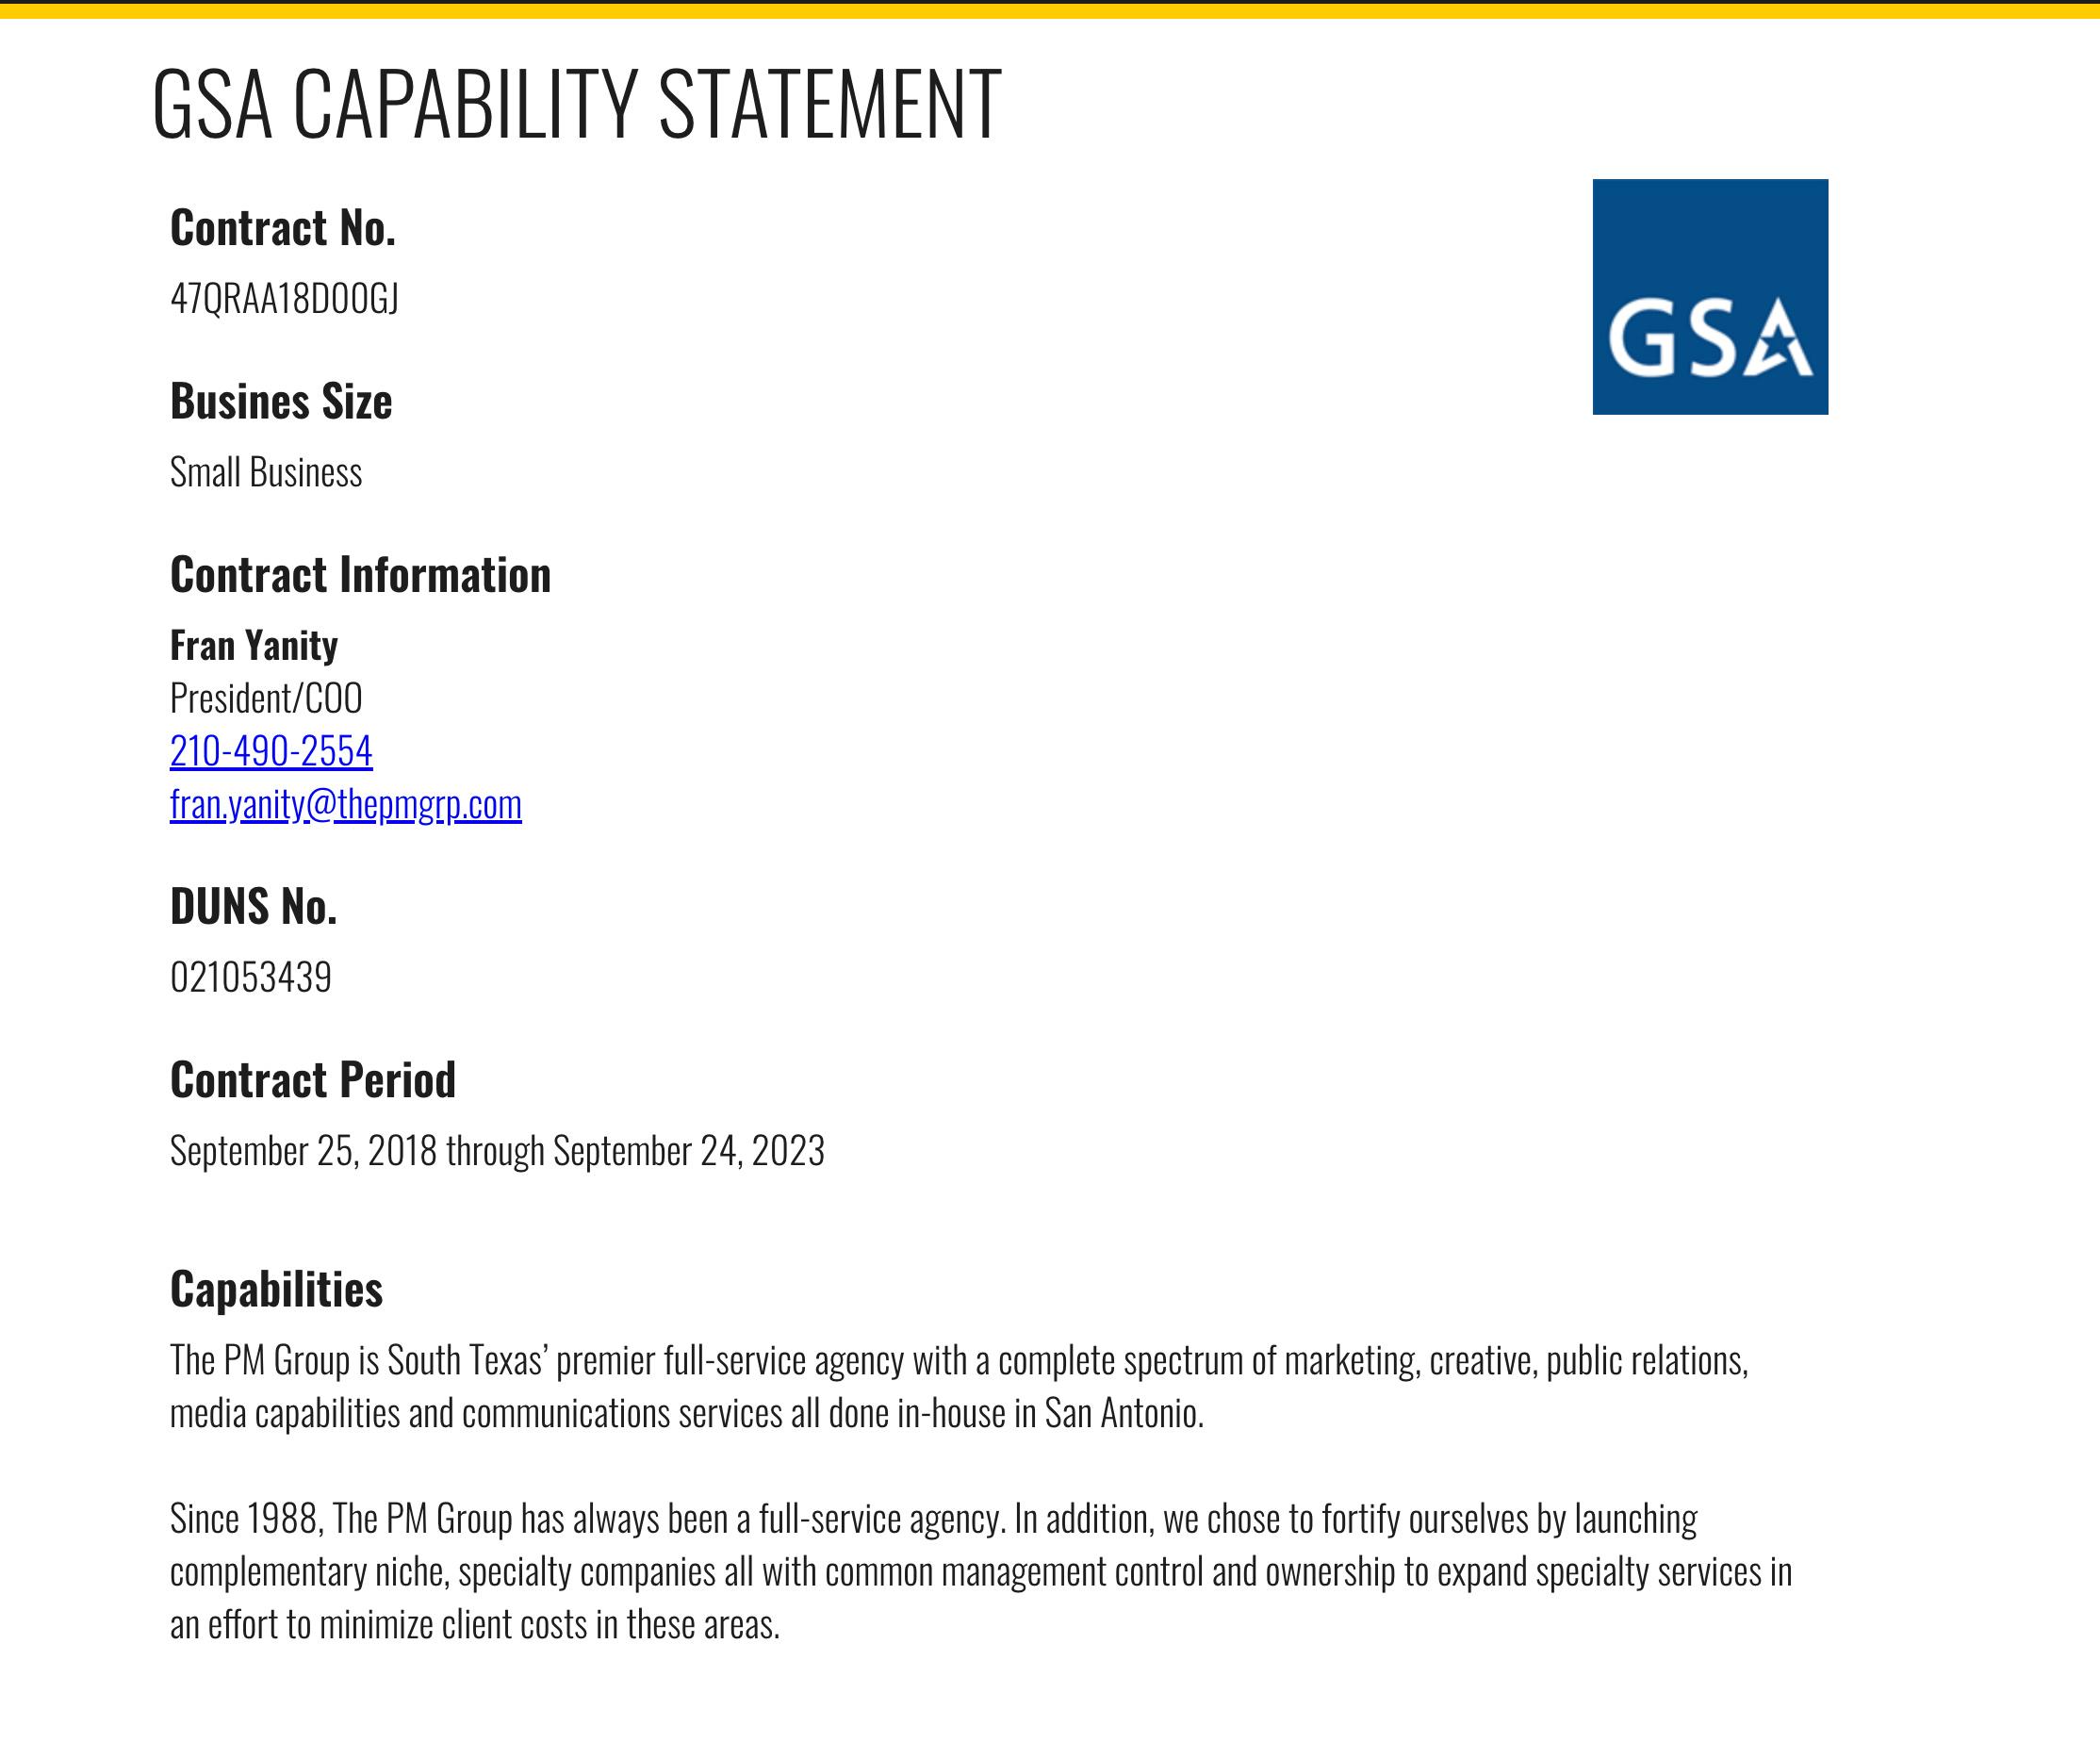 PMG GSA